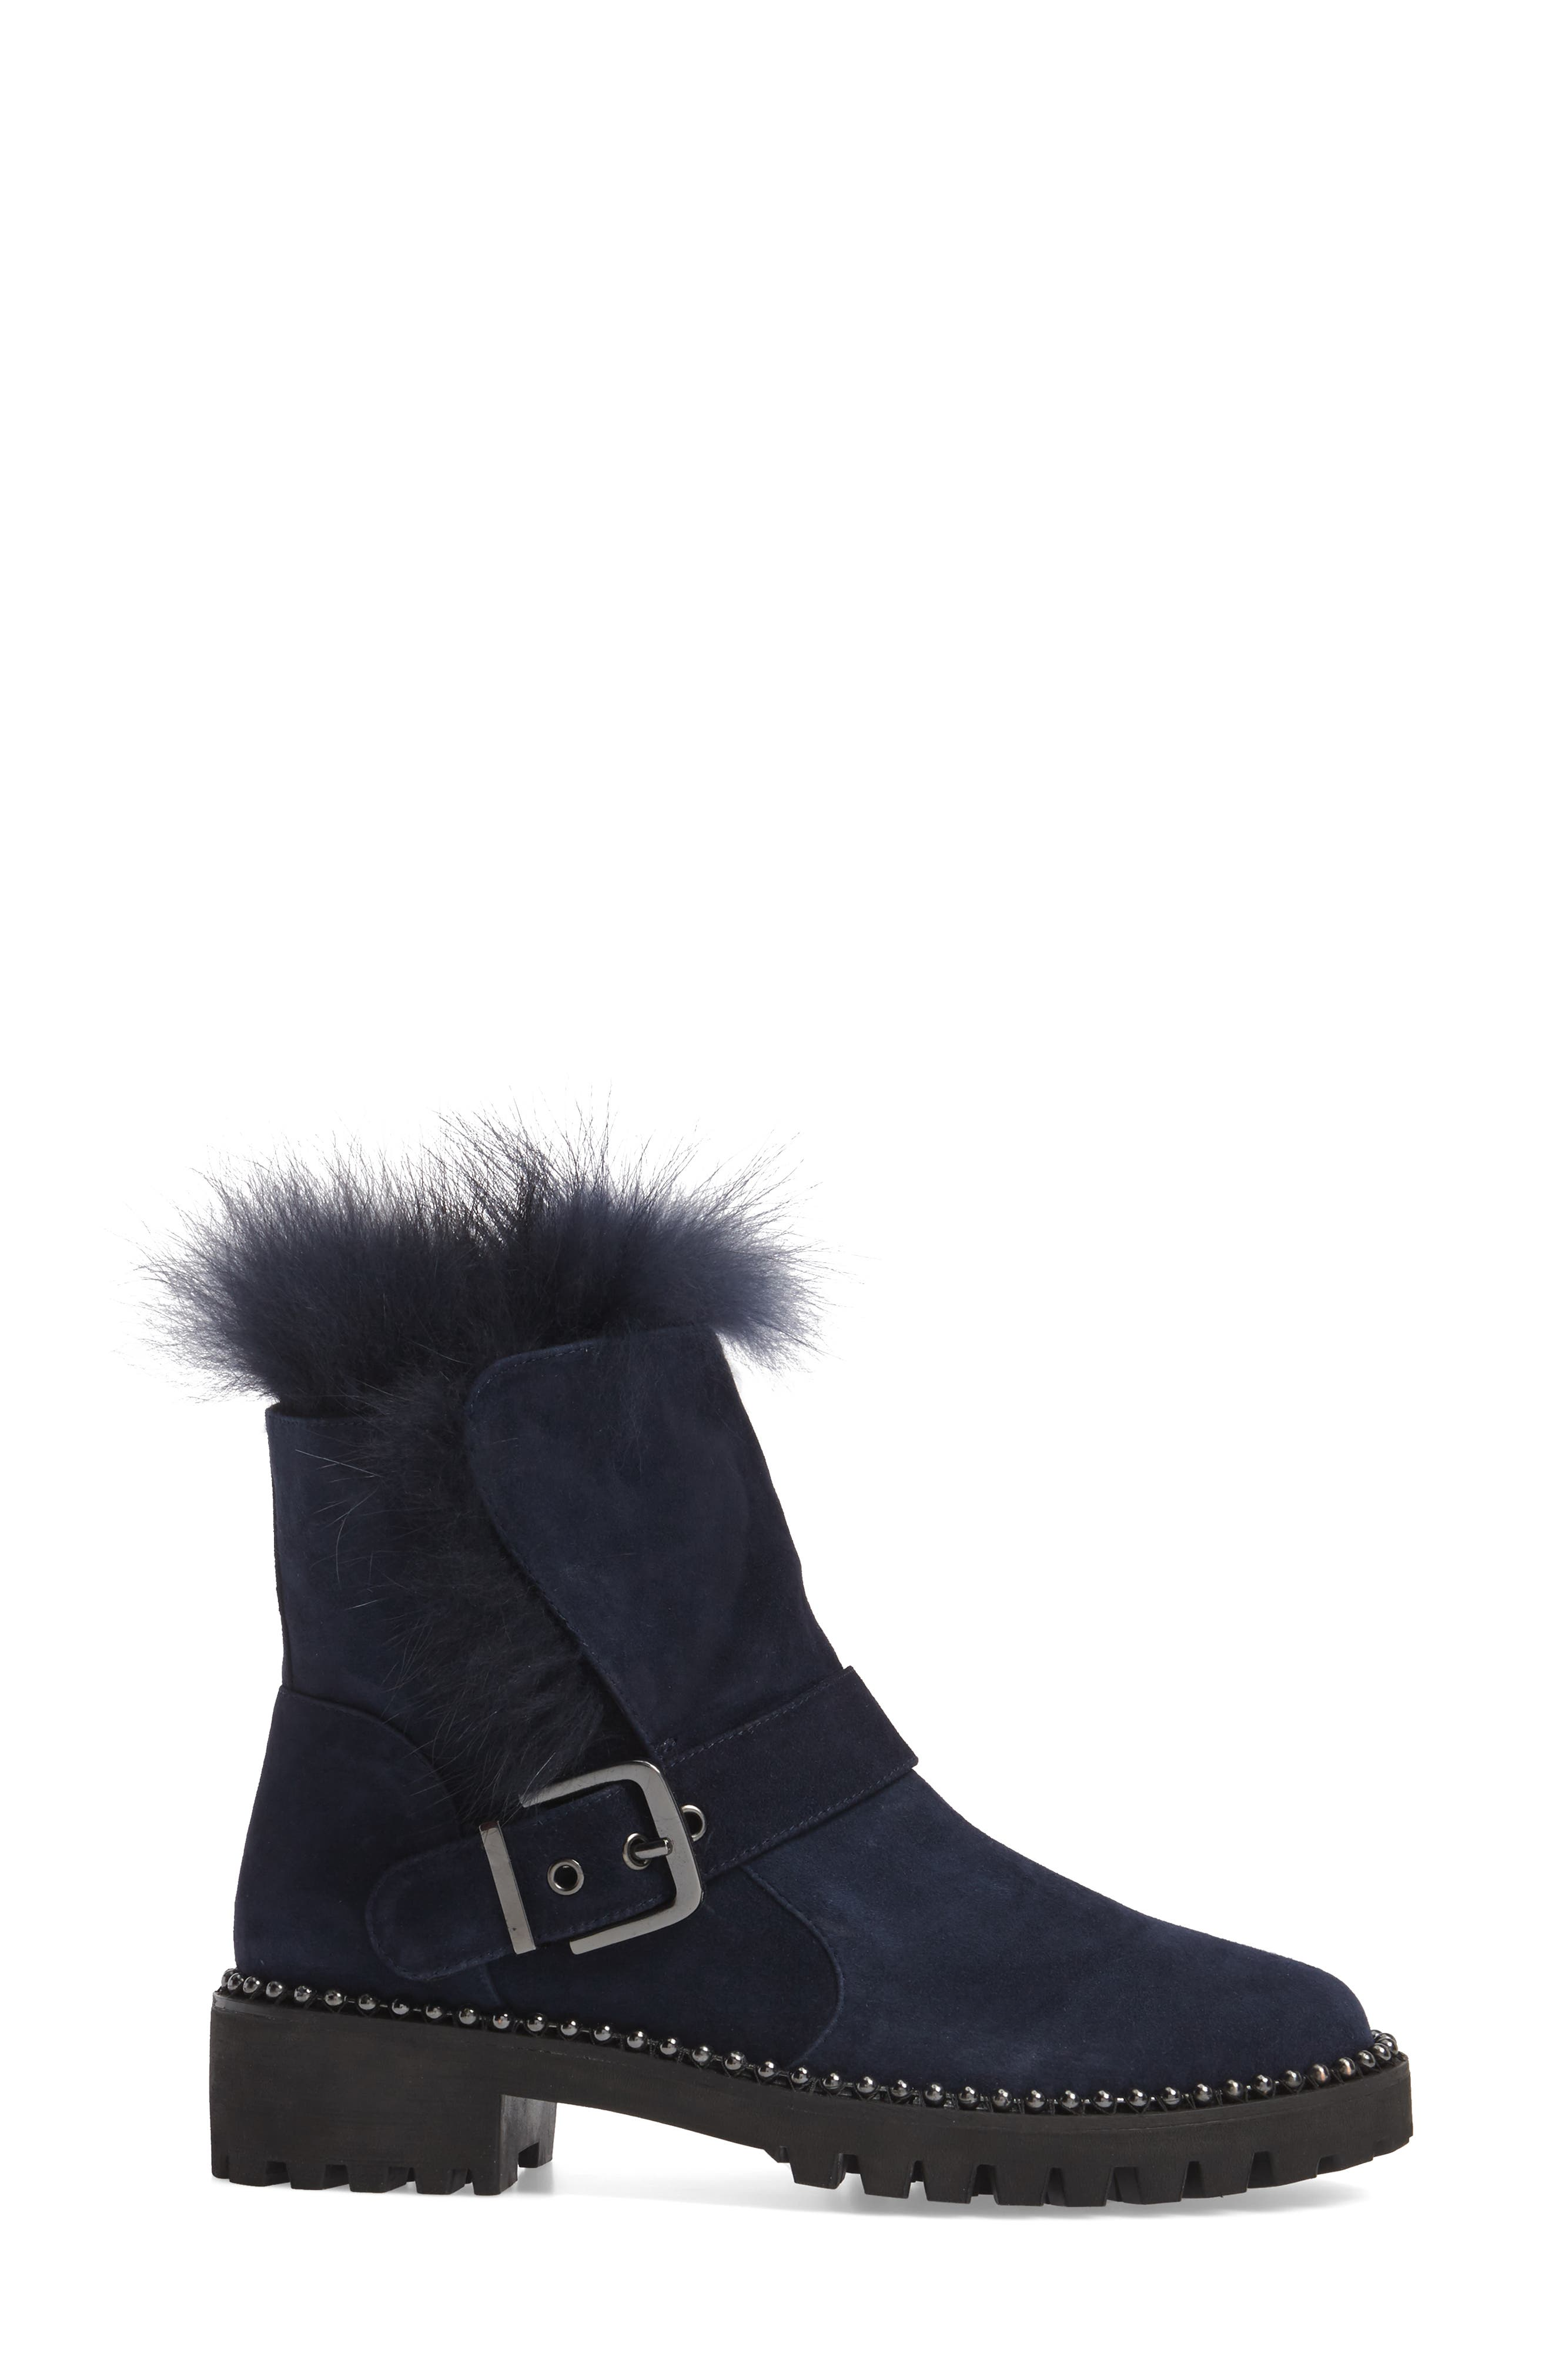 Alternate Image 3  - Cecelia New York Theresa Boot with Genuine Fox Fur Trim (Women)